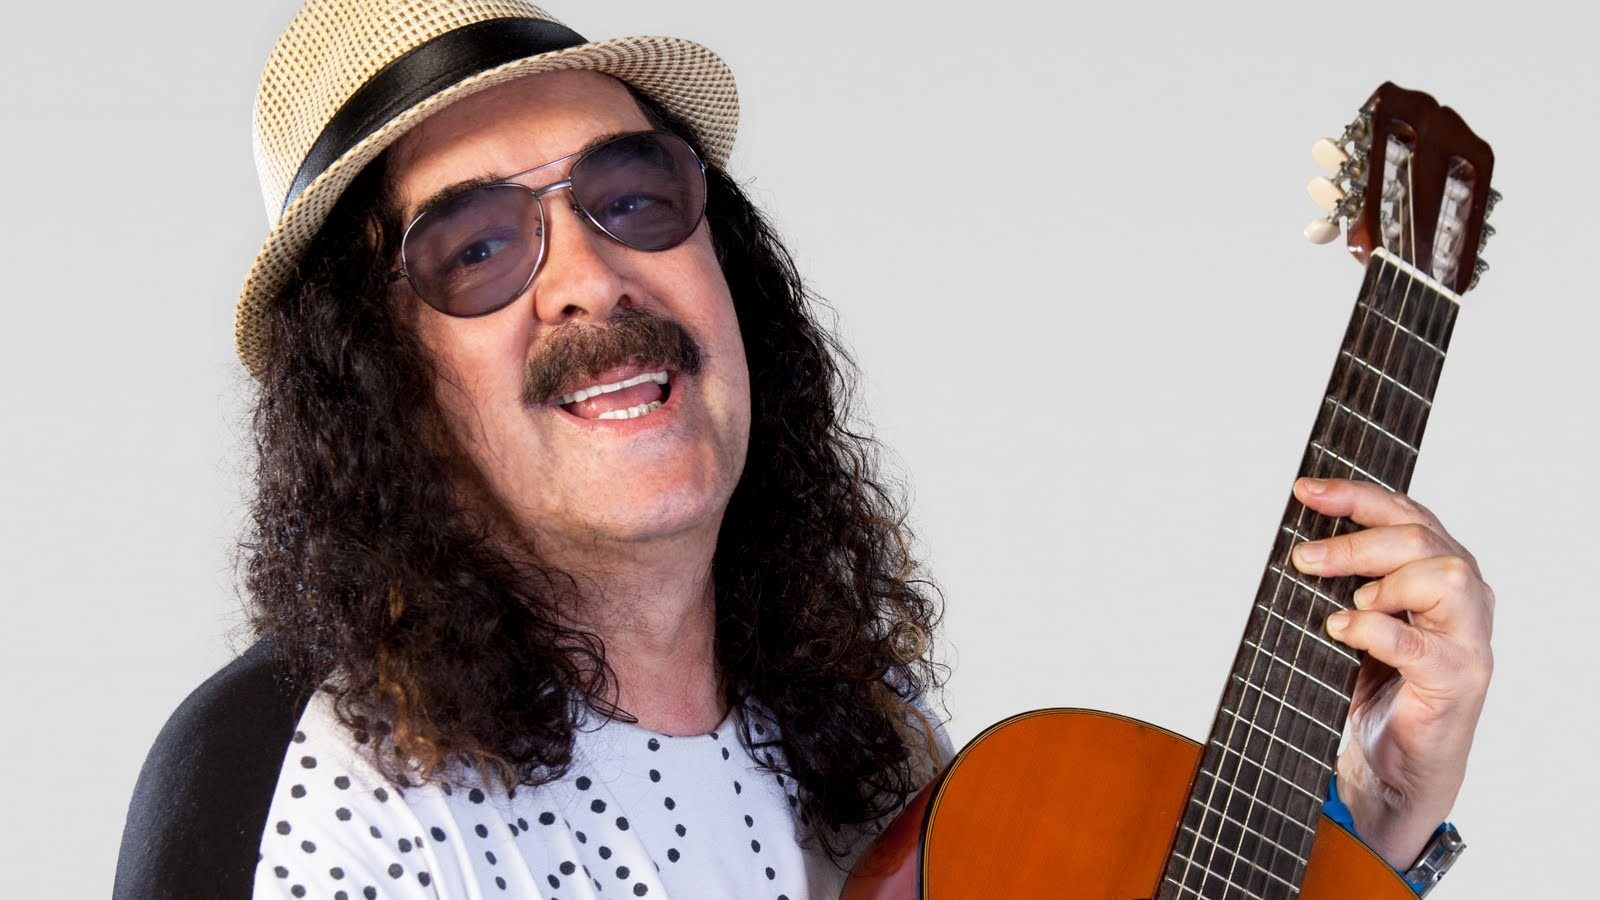 Morre o cantor Moraes Moreira, aos 72 anos